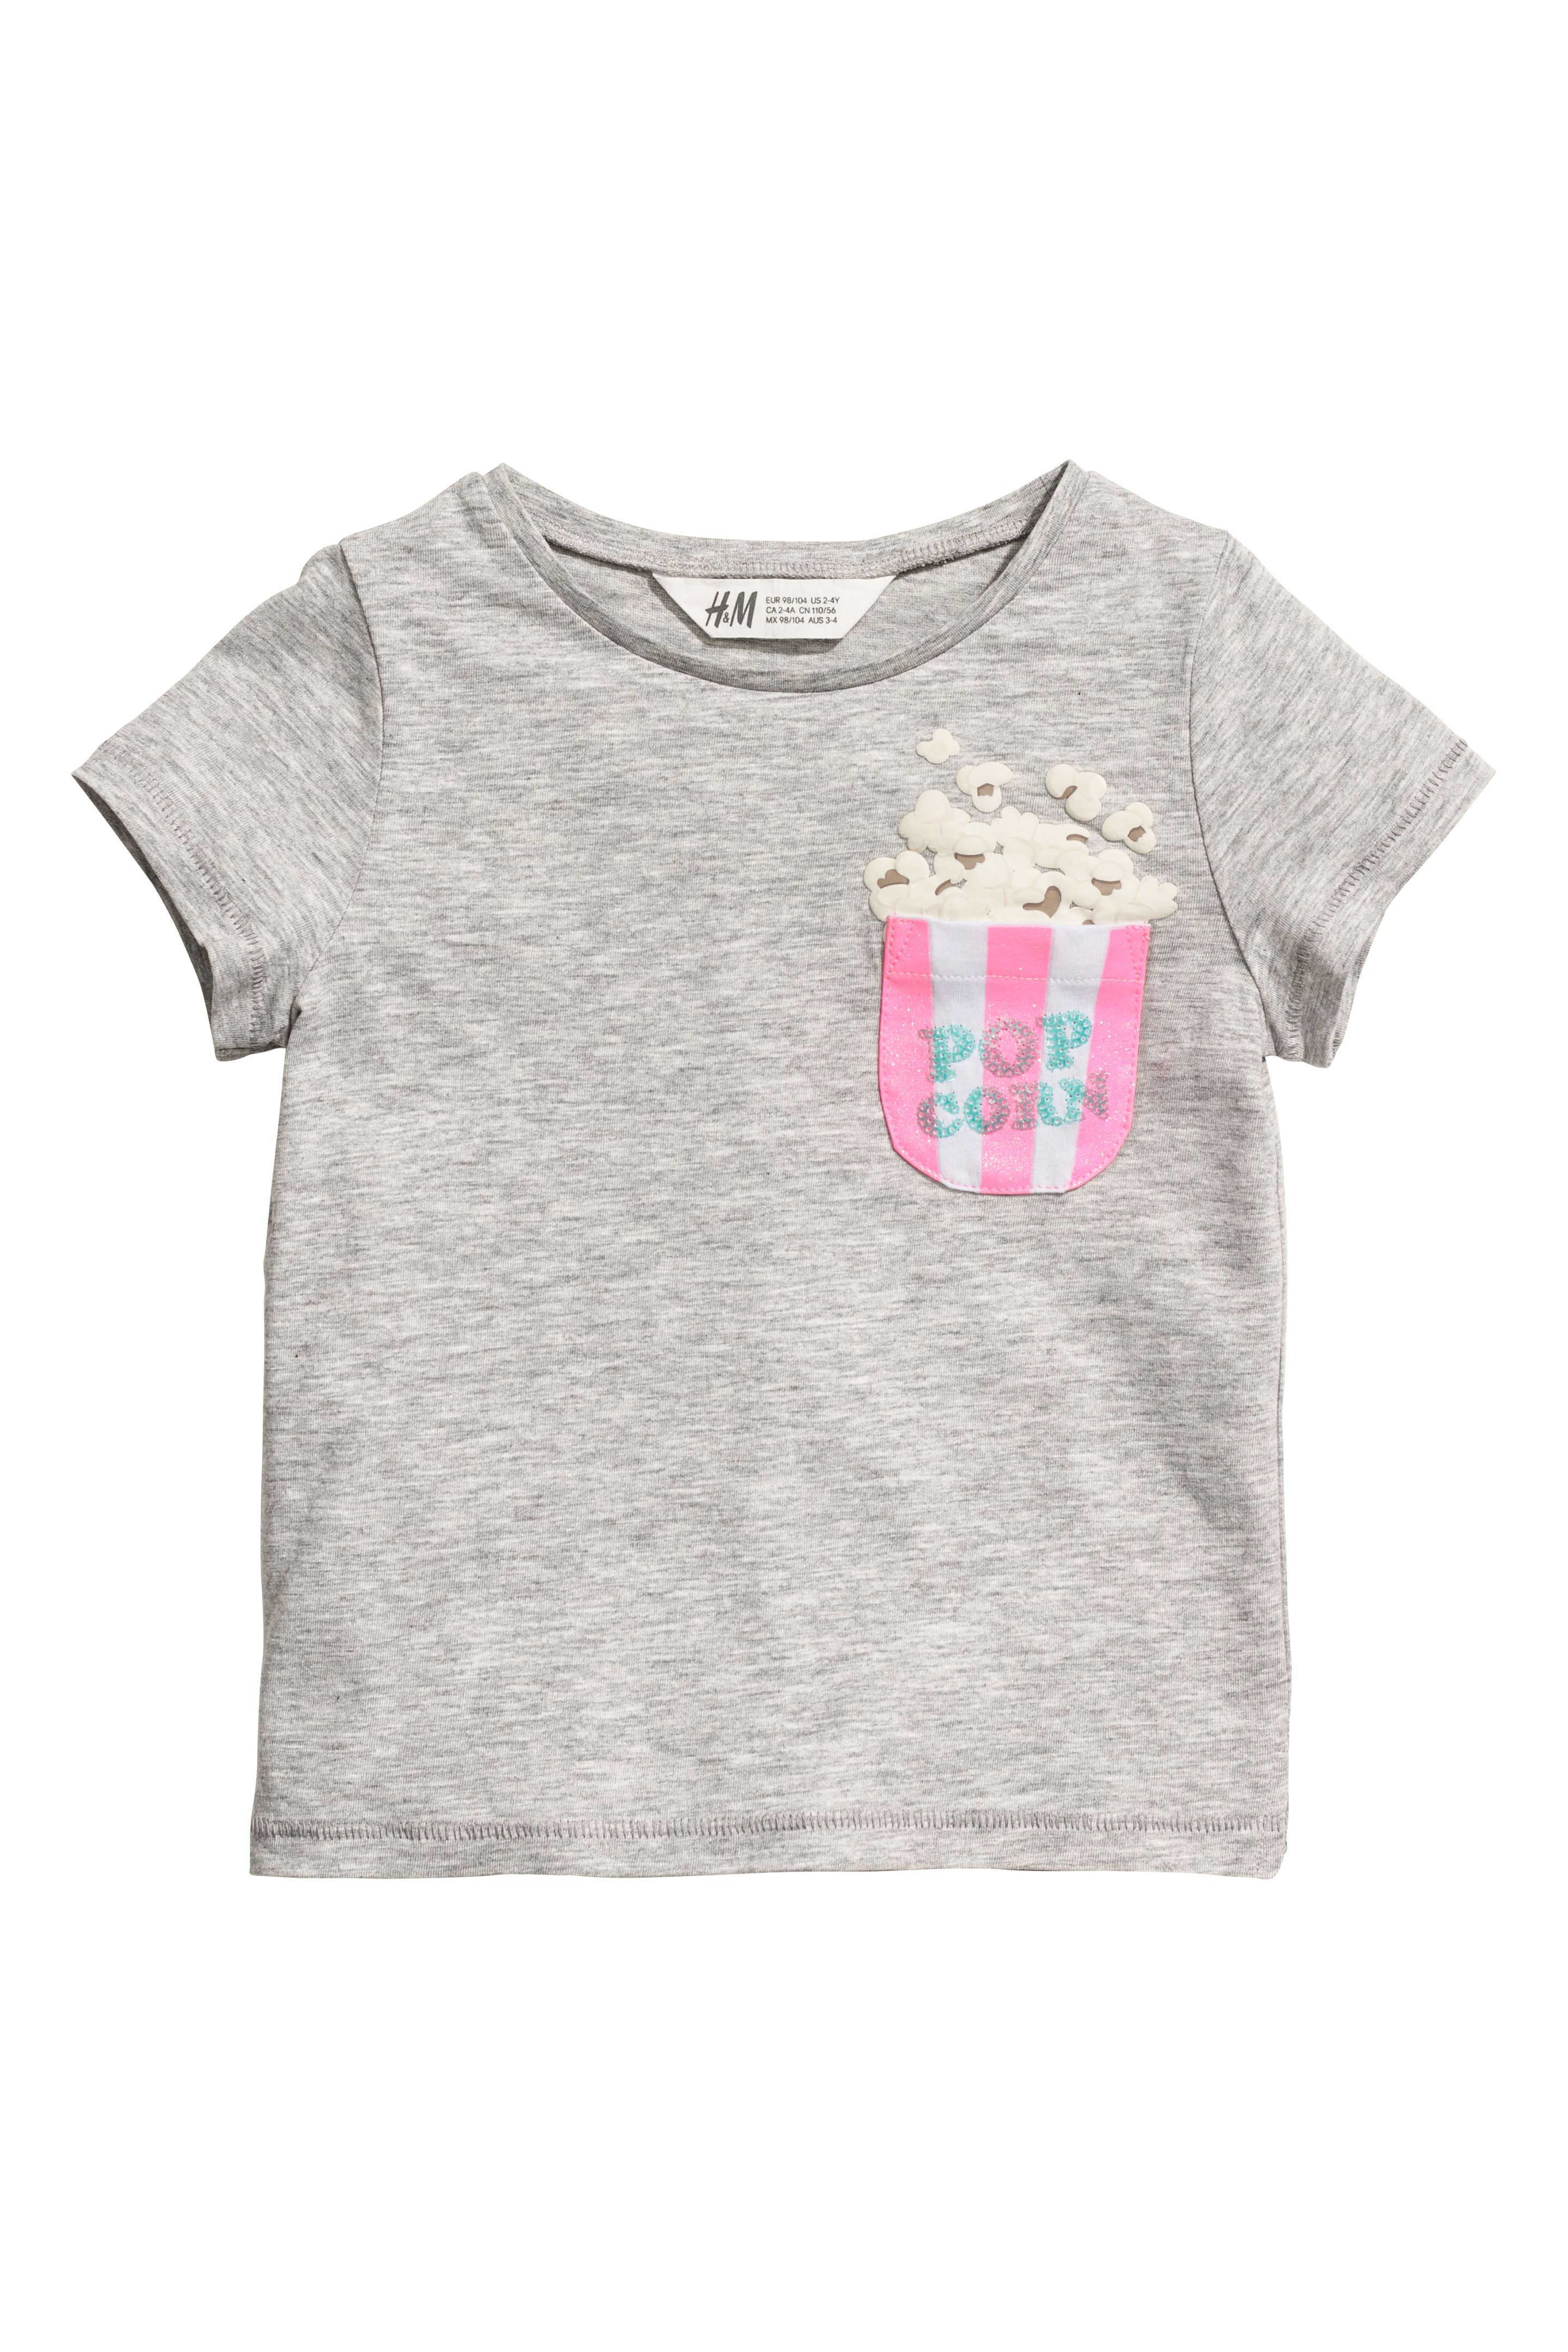 Boho Con Vestiti Shirt TaschinoLittle T Baby NeonatiE 0N8mnvw